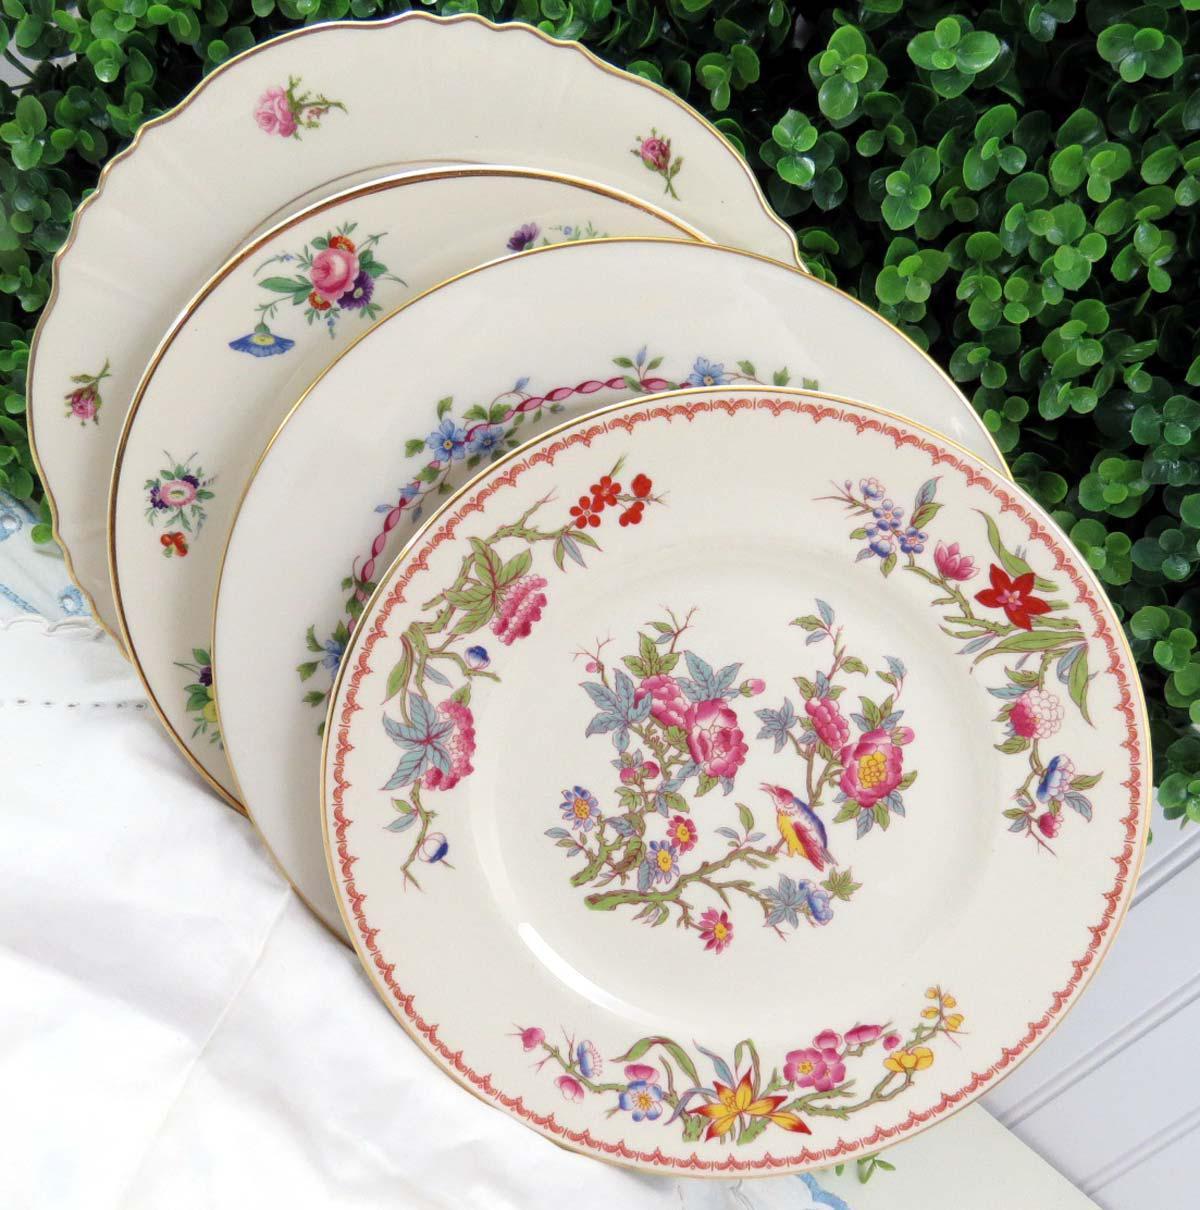 Vintage Mismatched Fine China Dinner Plates - Set of 4 - Image 7 of 7 & Vintage Mismatched Fine China Dinner Plates - Set of 4 | Chairish